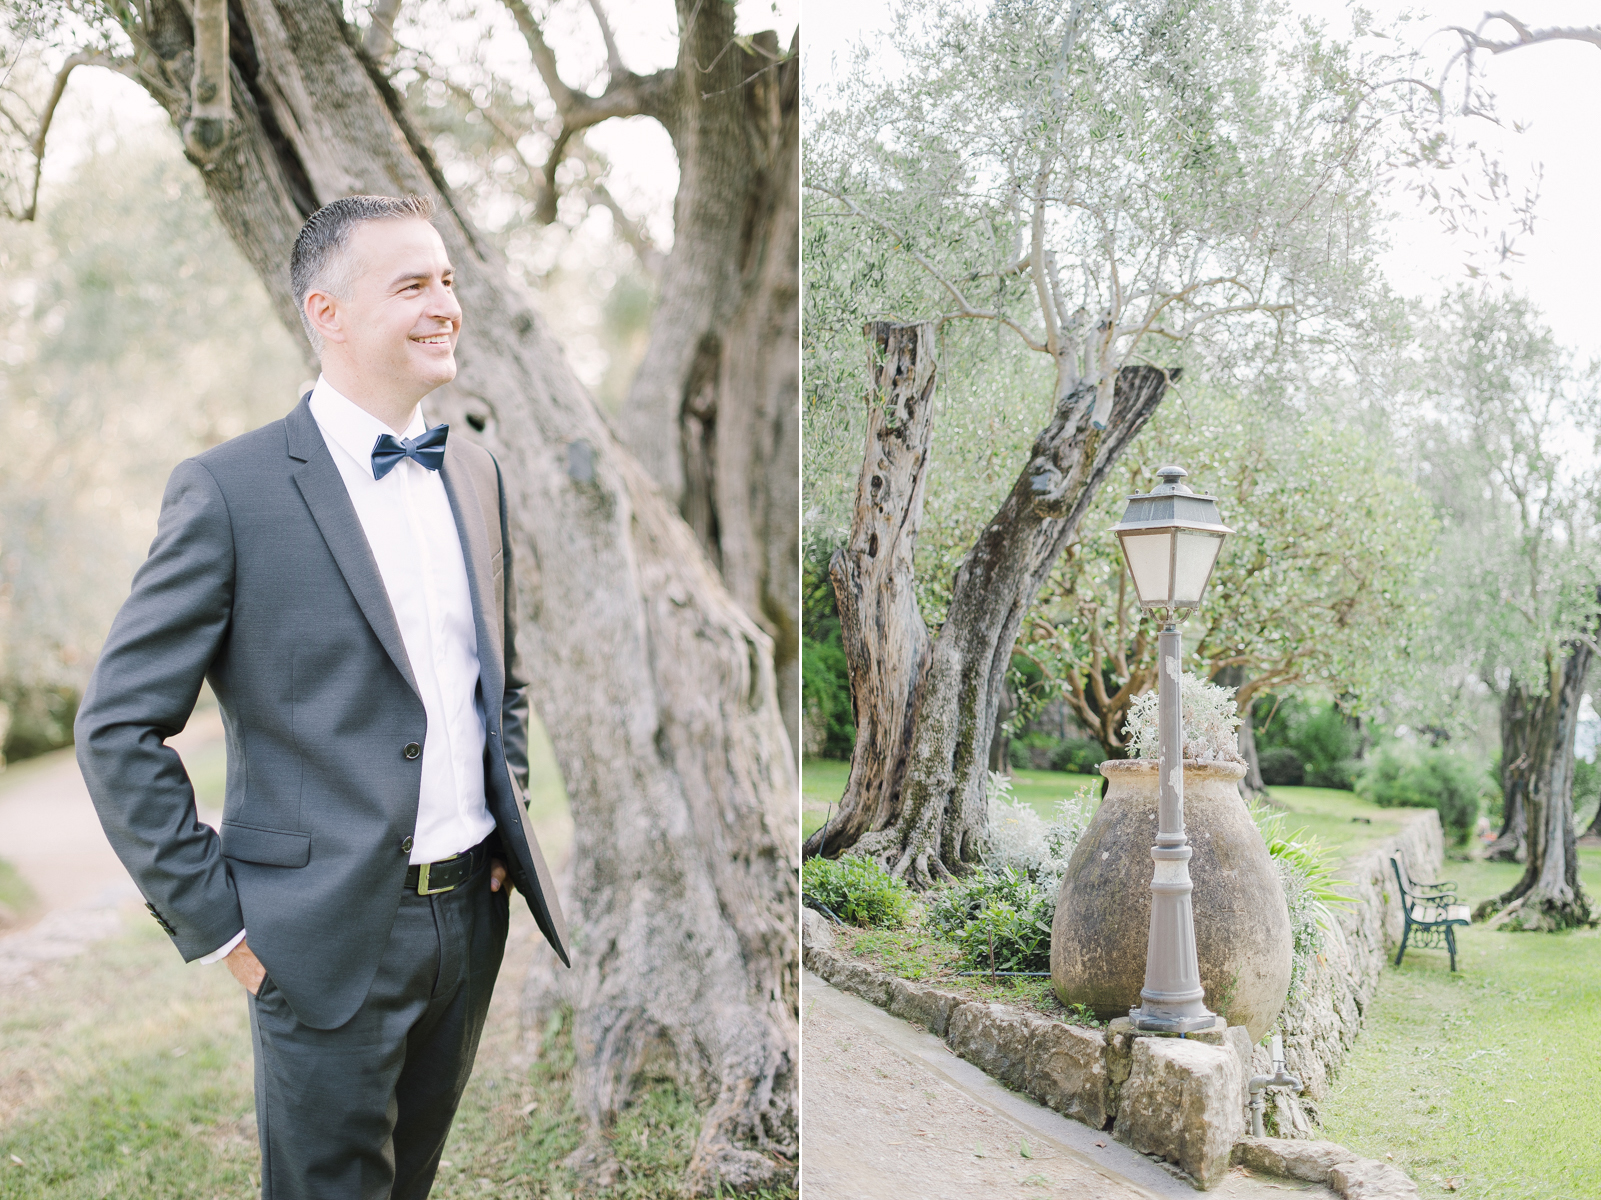 BohemeMoonPhotography-Grasse-provence-wedding-photographer_16.jpg